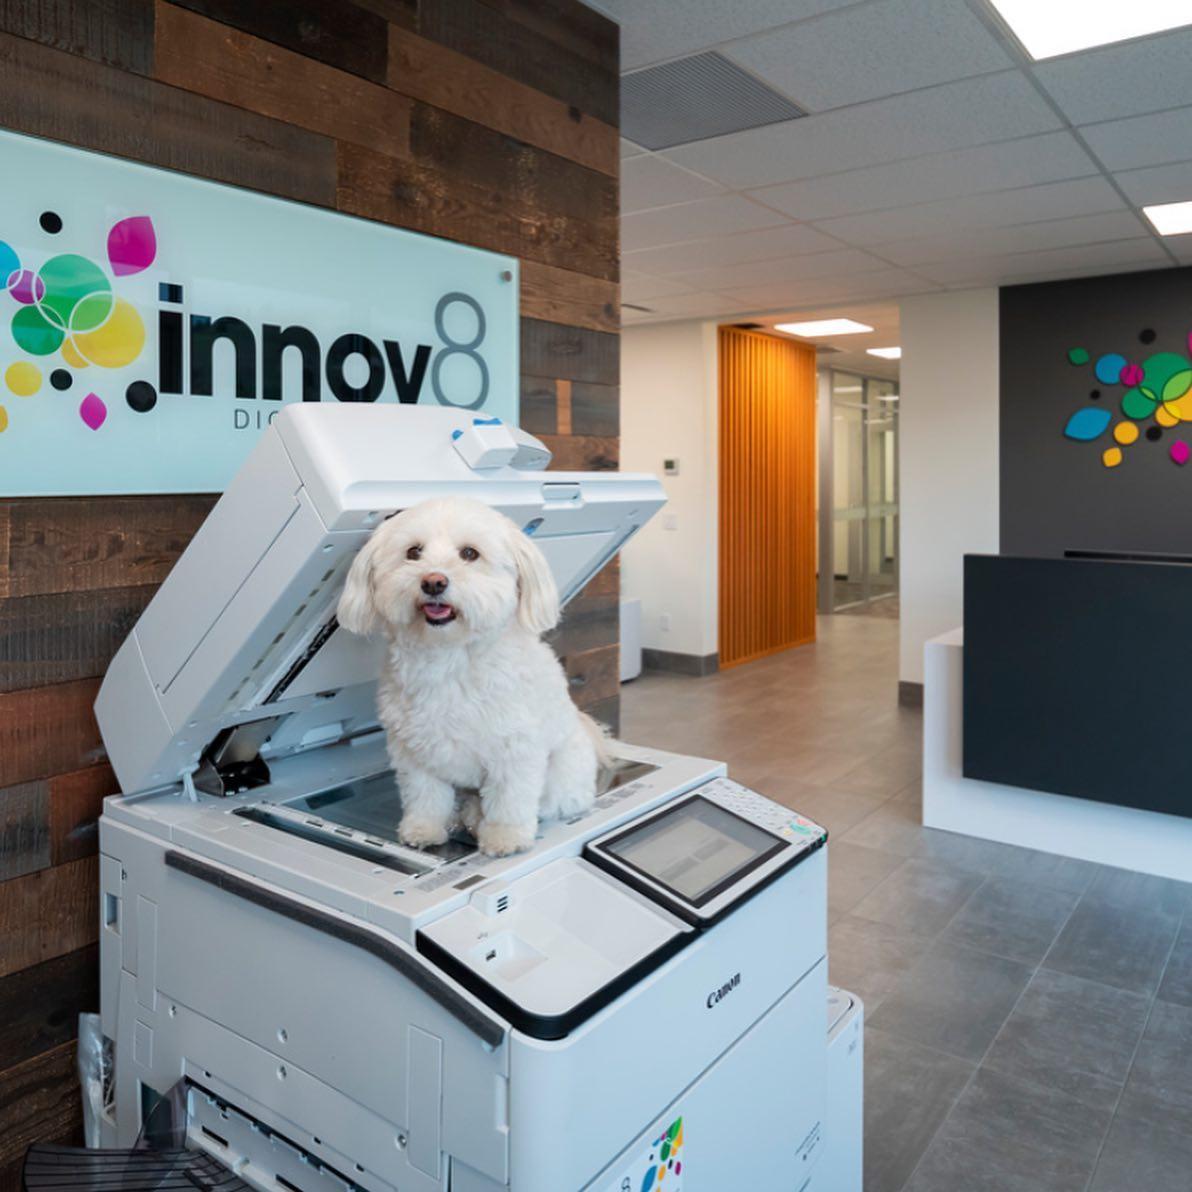 dog-on-canon-printer-at-innov8